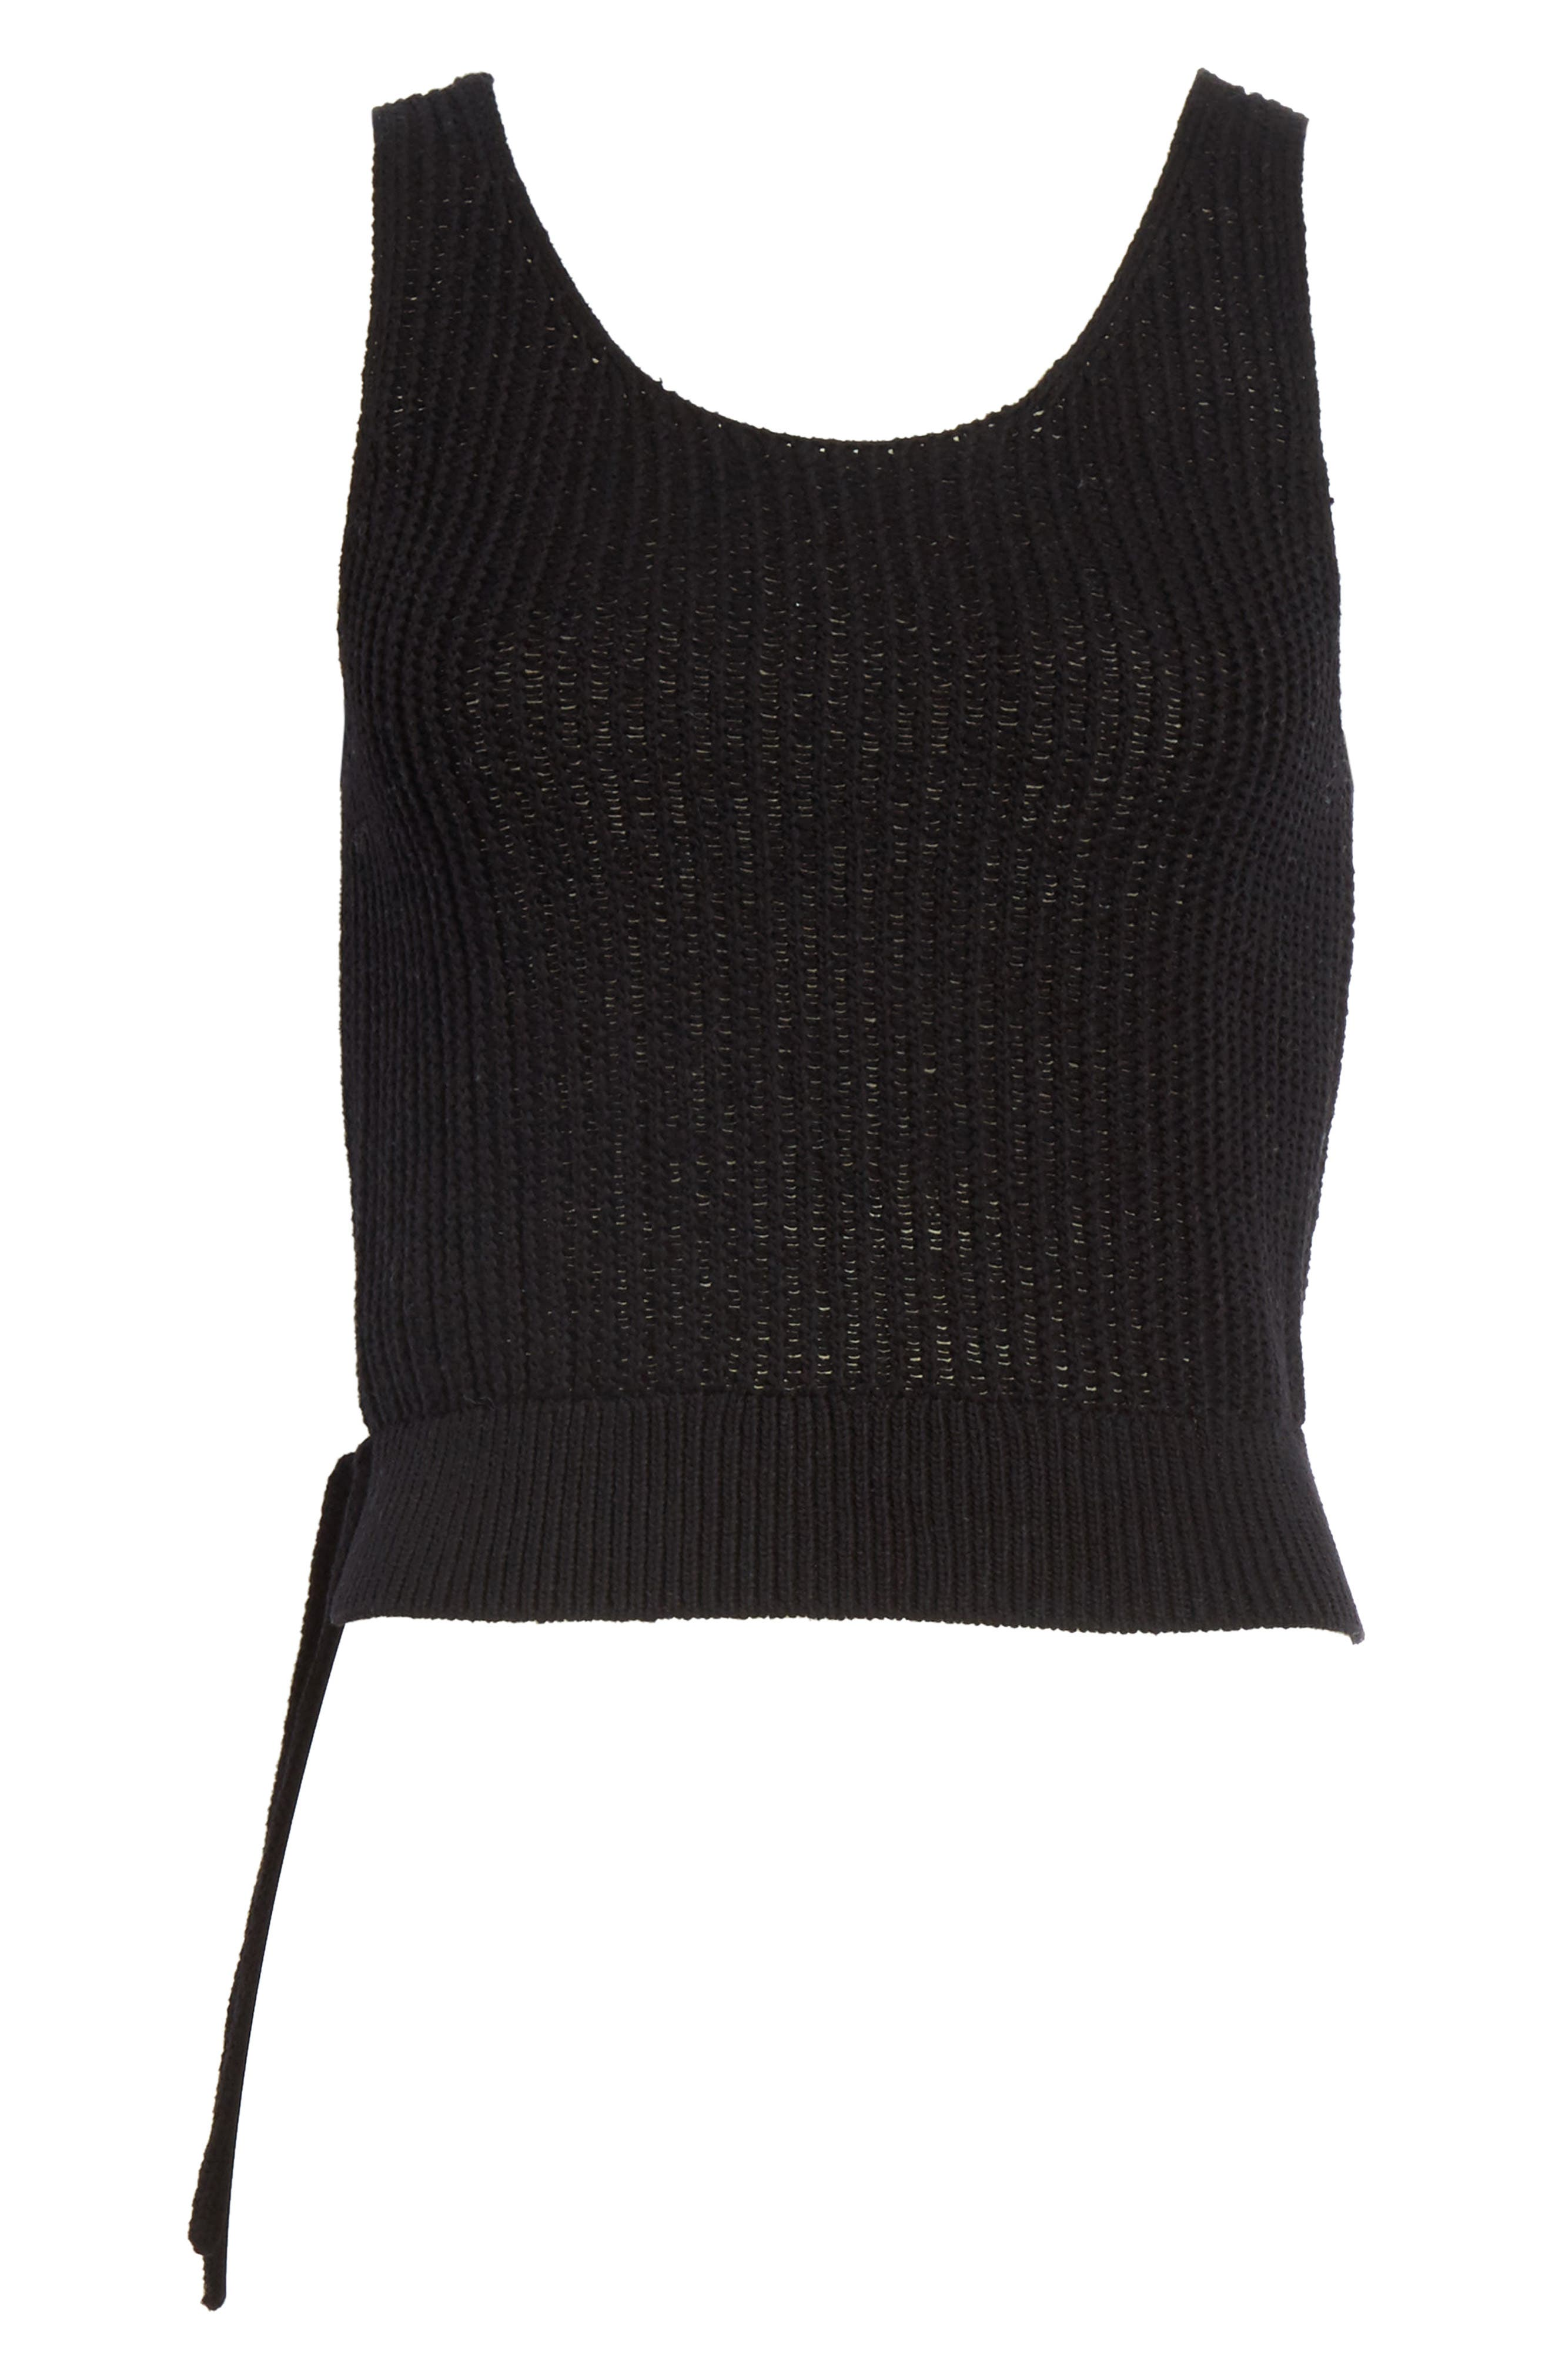 Crossover Back Tank Sweater,                             Alternate thumbnail 6, color,                             Black